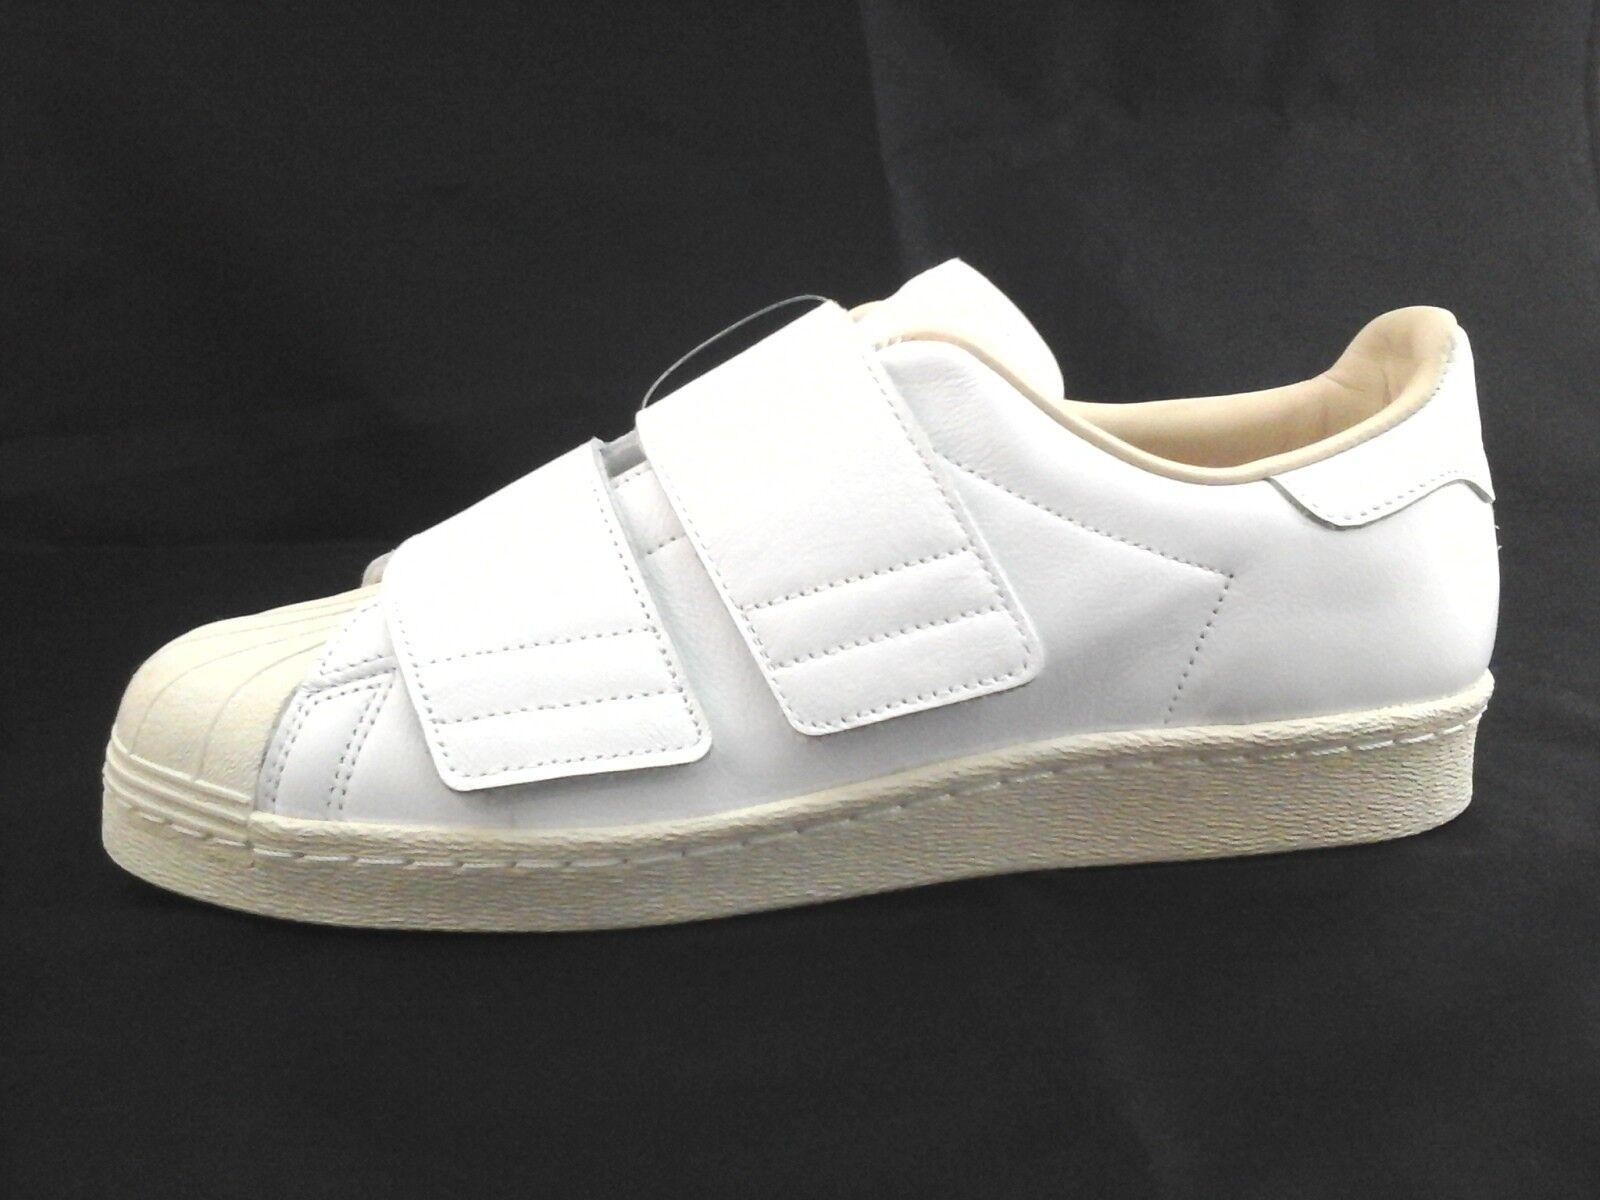 ADIDAS Superstar bianca Leather Leather Leather scarpe da ginnastica 80s Straps CQ2447 donna US 10.5 43 1 3 d0333d